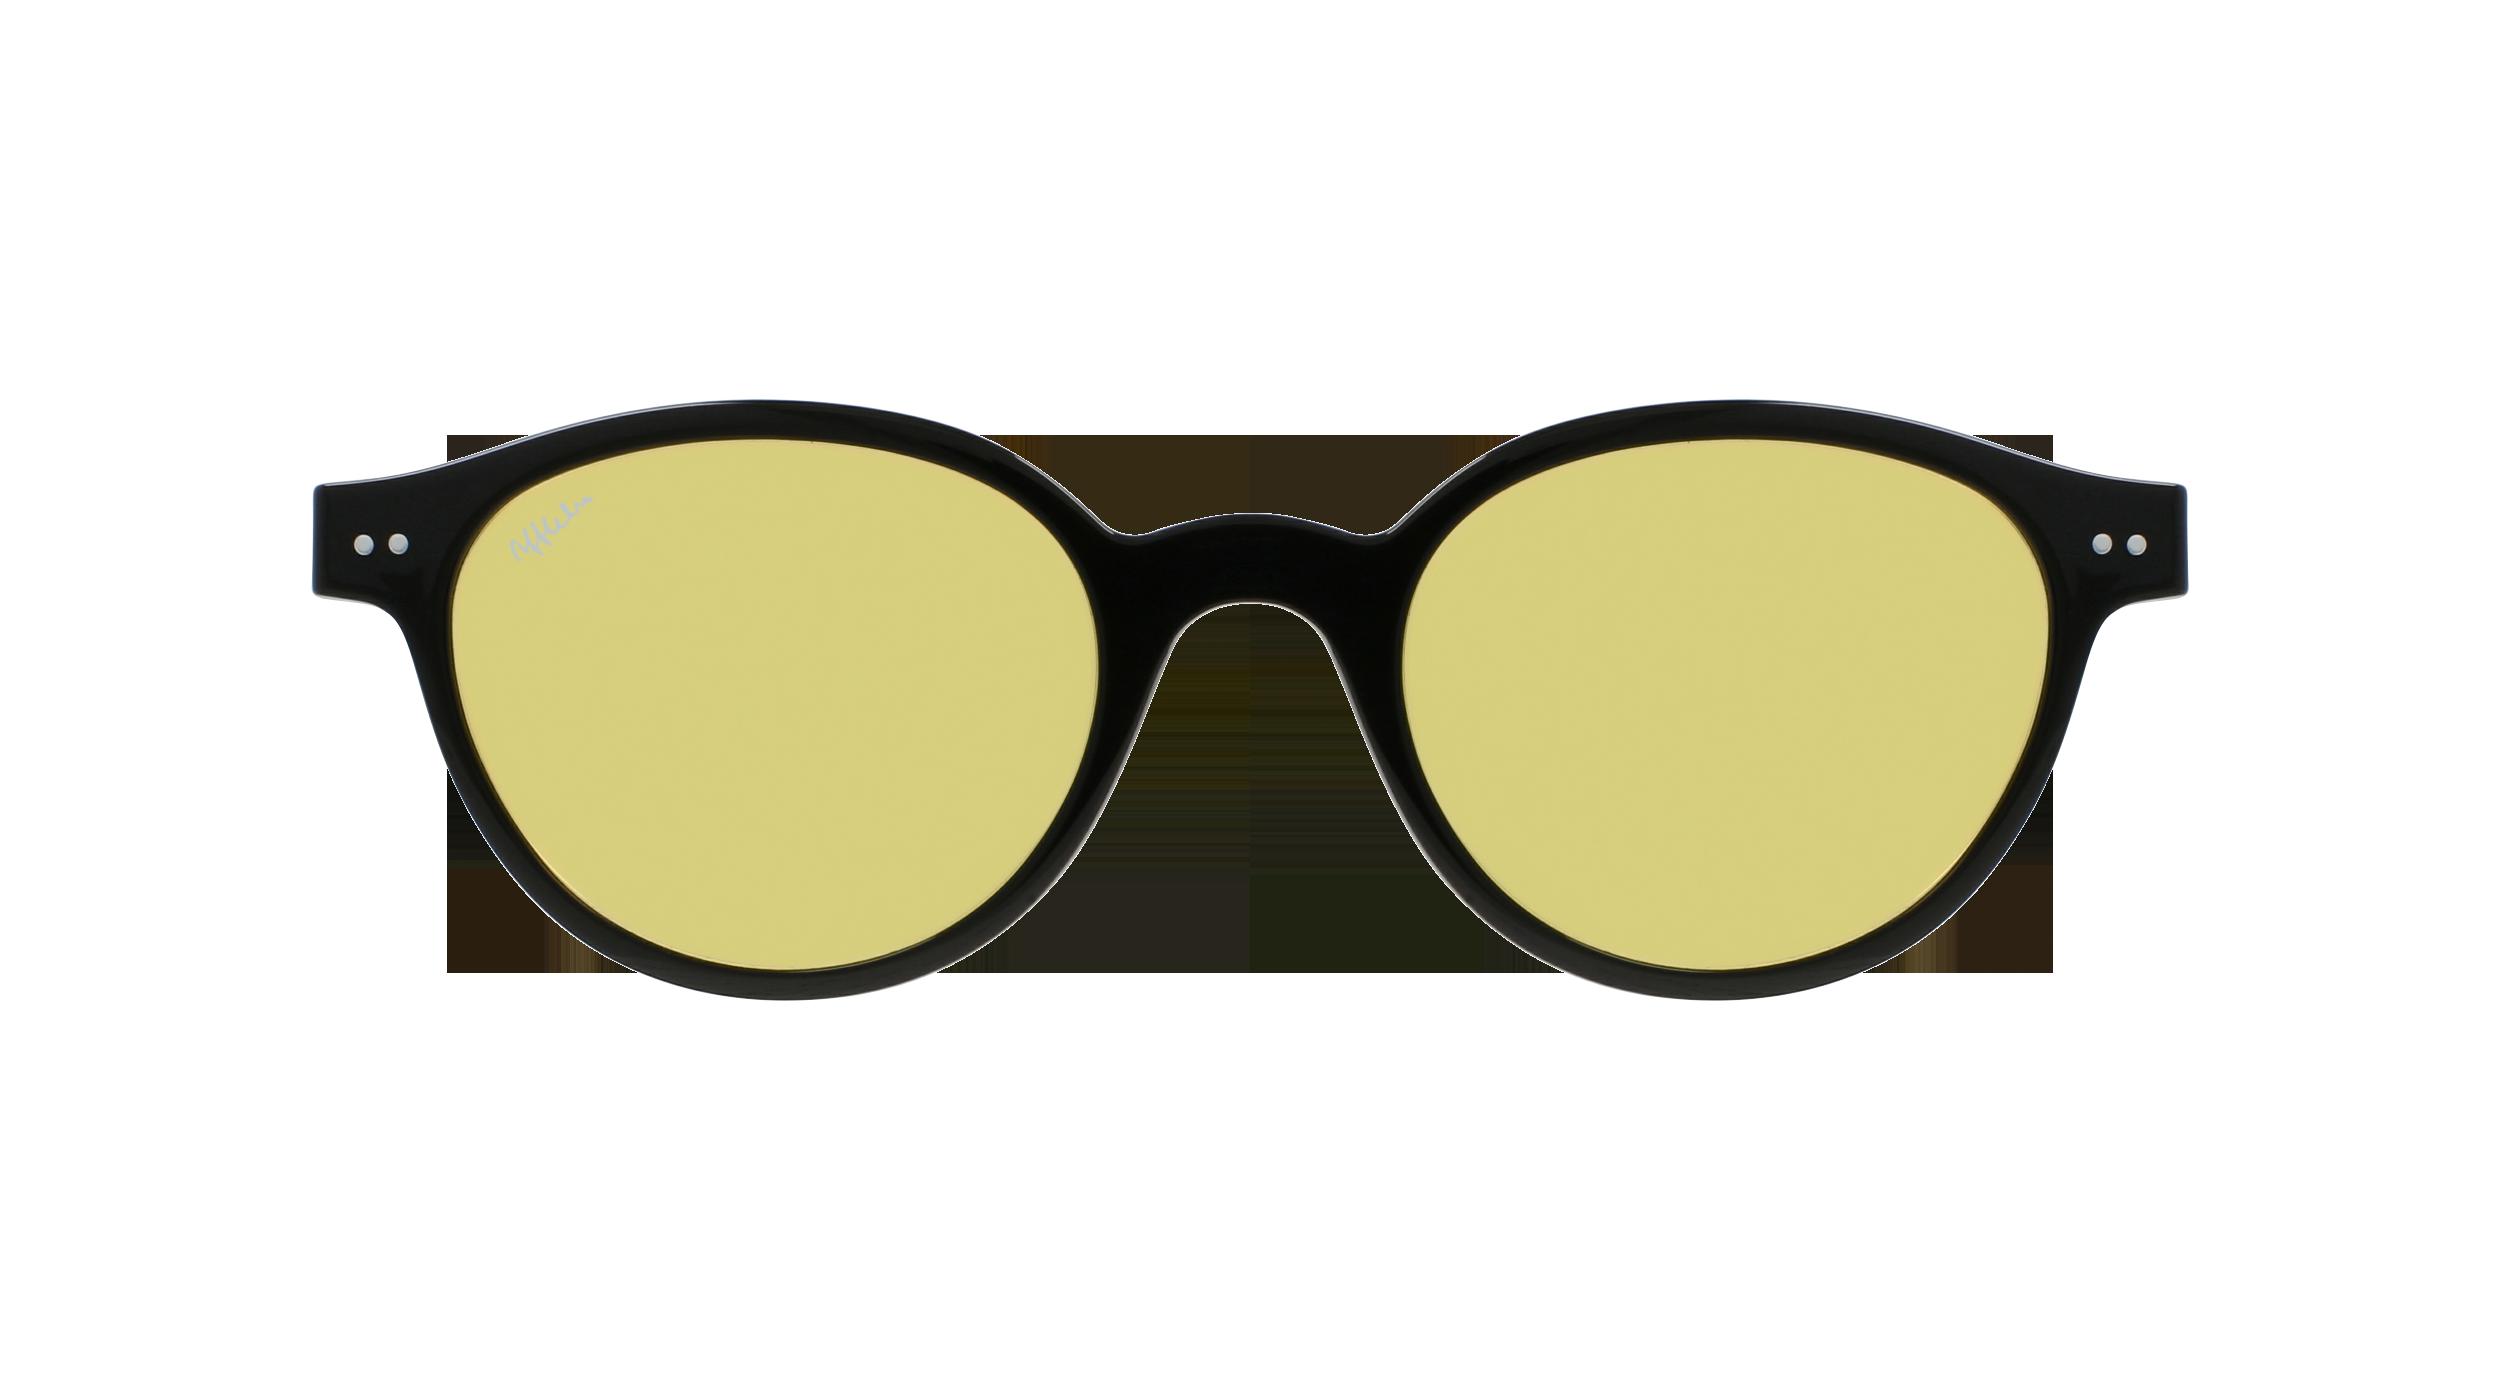 afflelou/france/products/smart_clip/clips_glasses/07630036436561.png